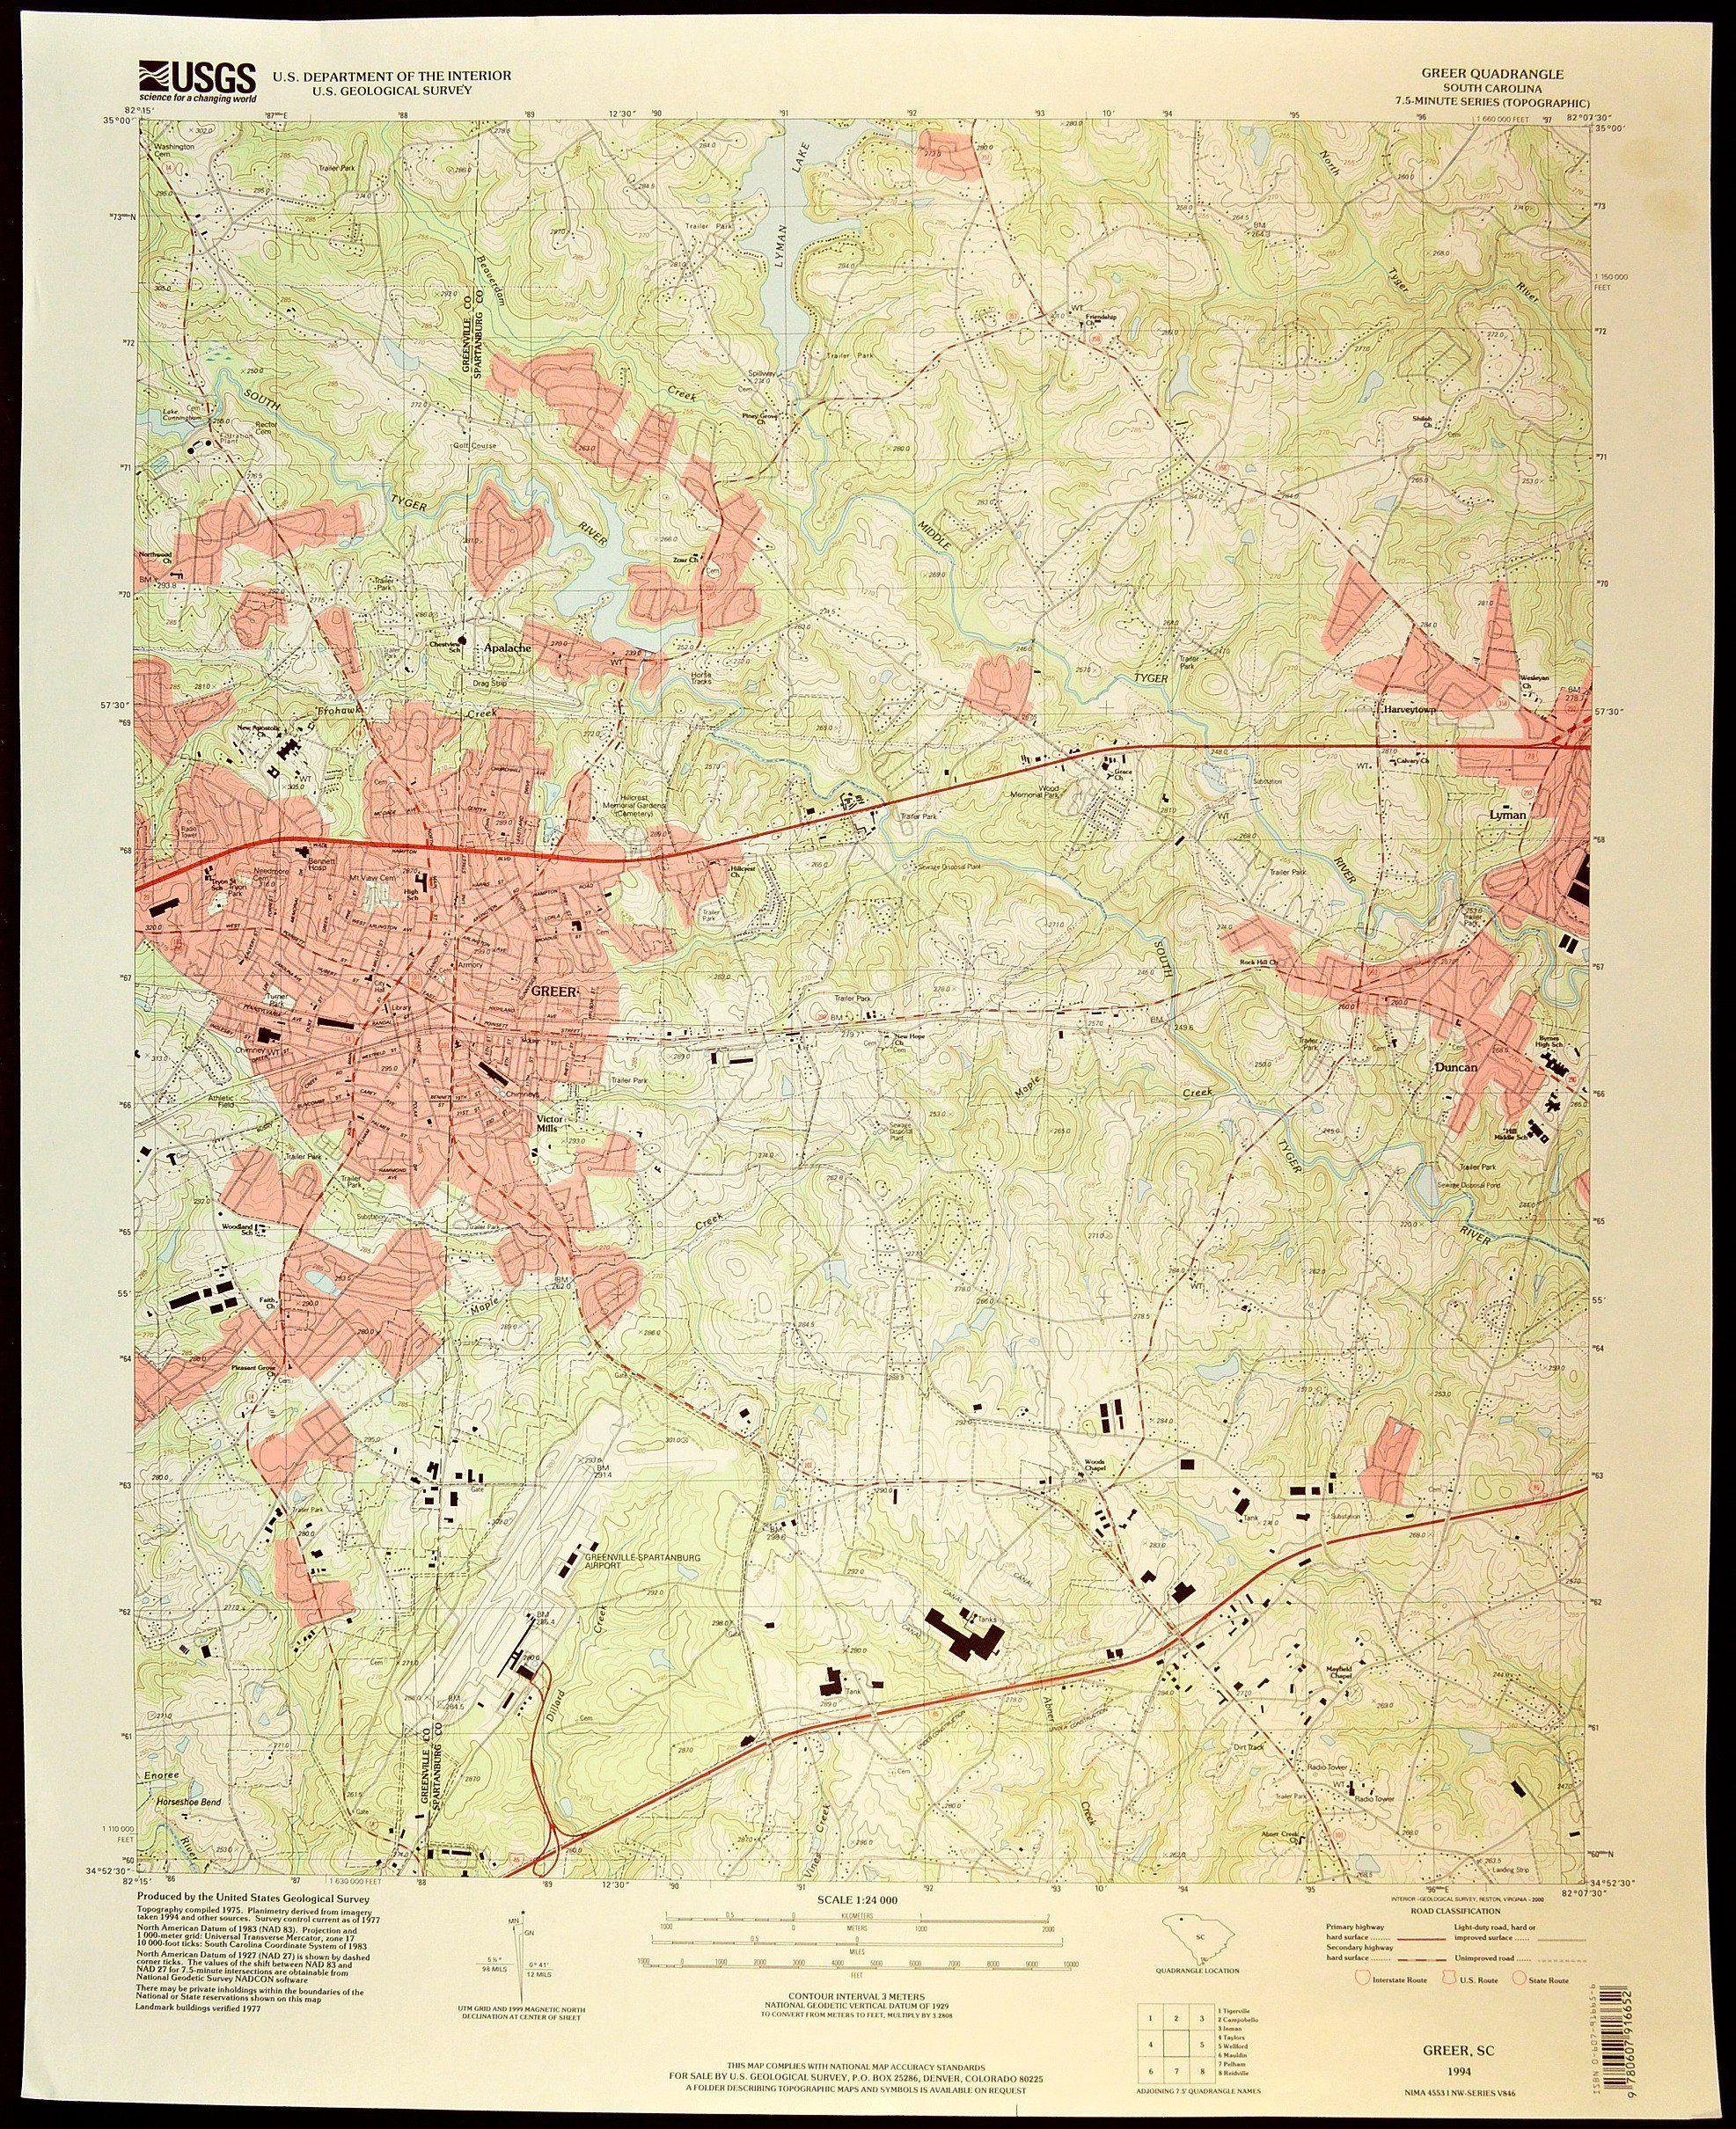 Greer Map Of Greer South Carolina Art Print Wall Decor Large